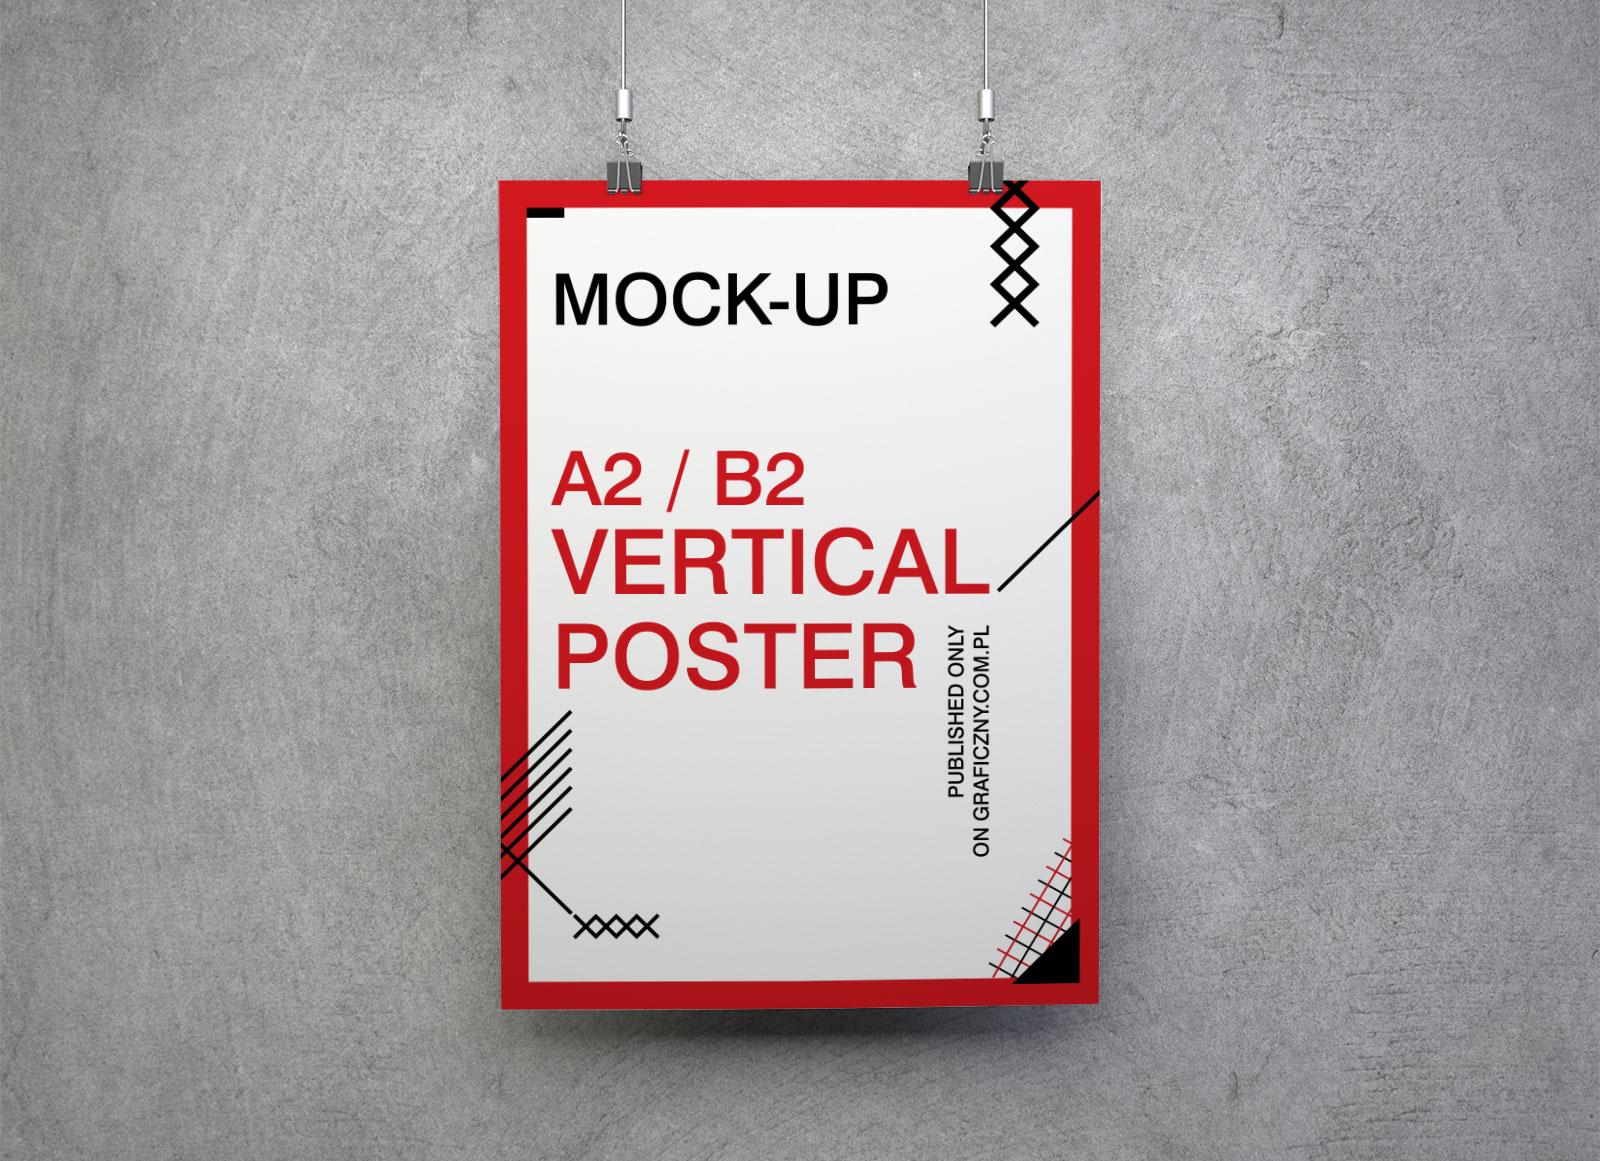 Free-Vertical-Poster-Mockup-PSD